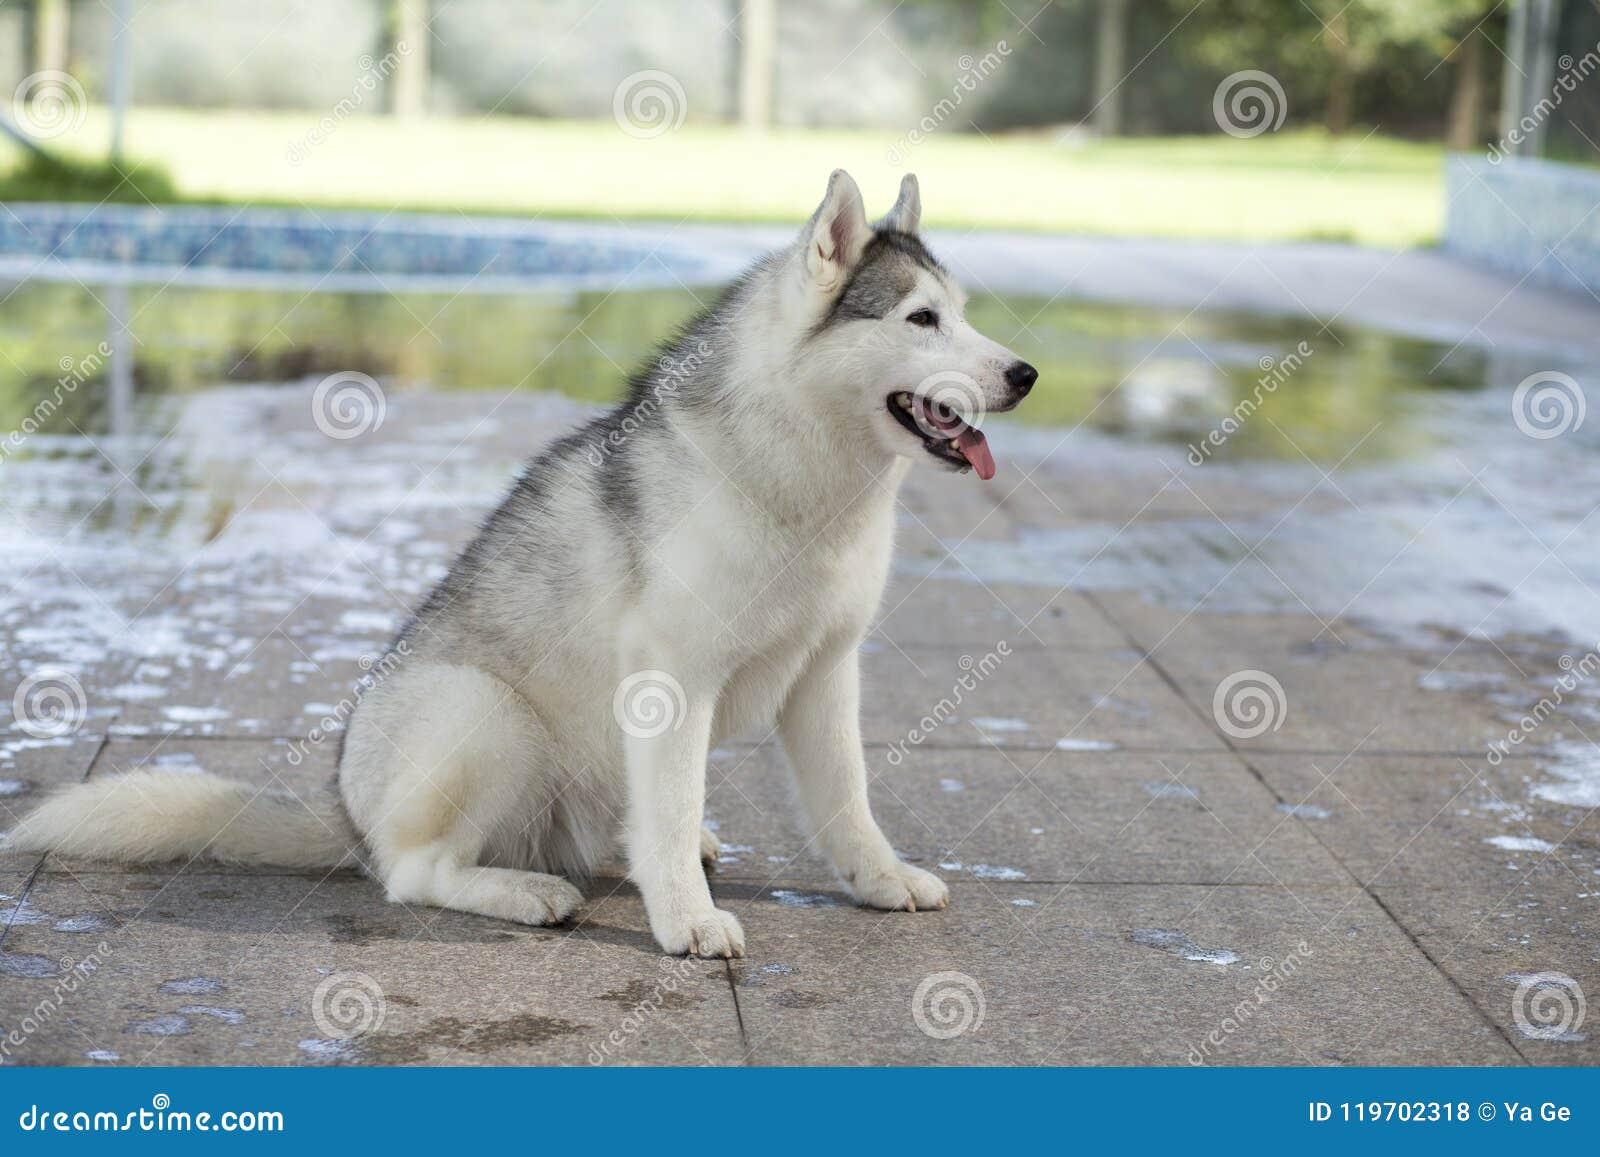 Siberian Husky Dog Stock Photo Image Of Siberia Sled 119702318